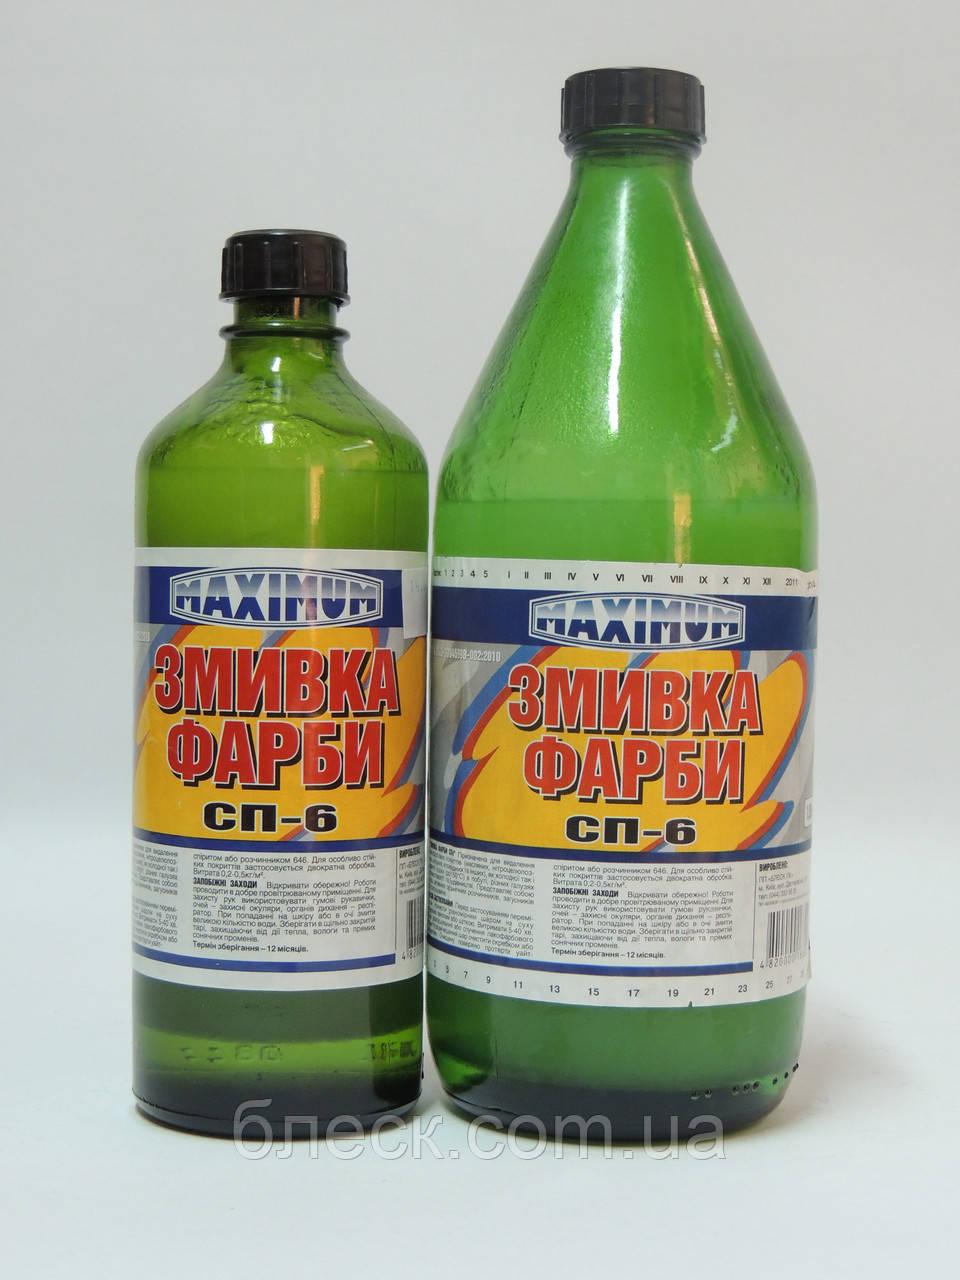 "Смывка краски СП-6 ""MAXIMUM"" 1,05 кг (стеклобутылка 1 л)"